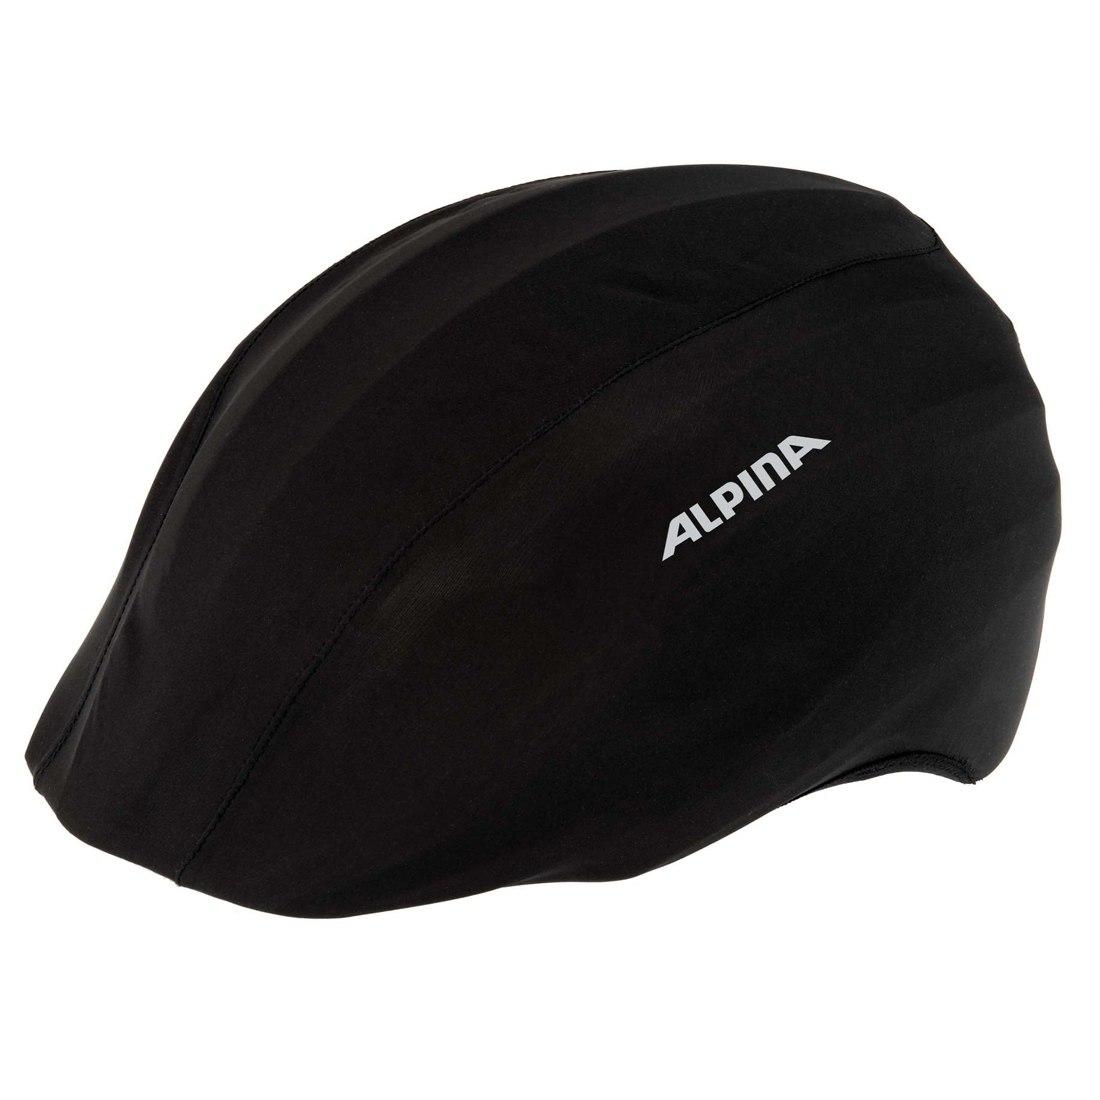 Alpina Multi-Fit Raincover Helmet - black